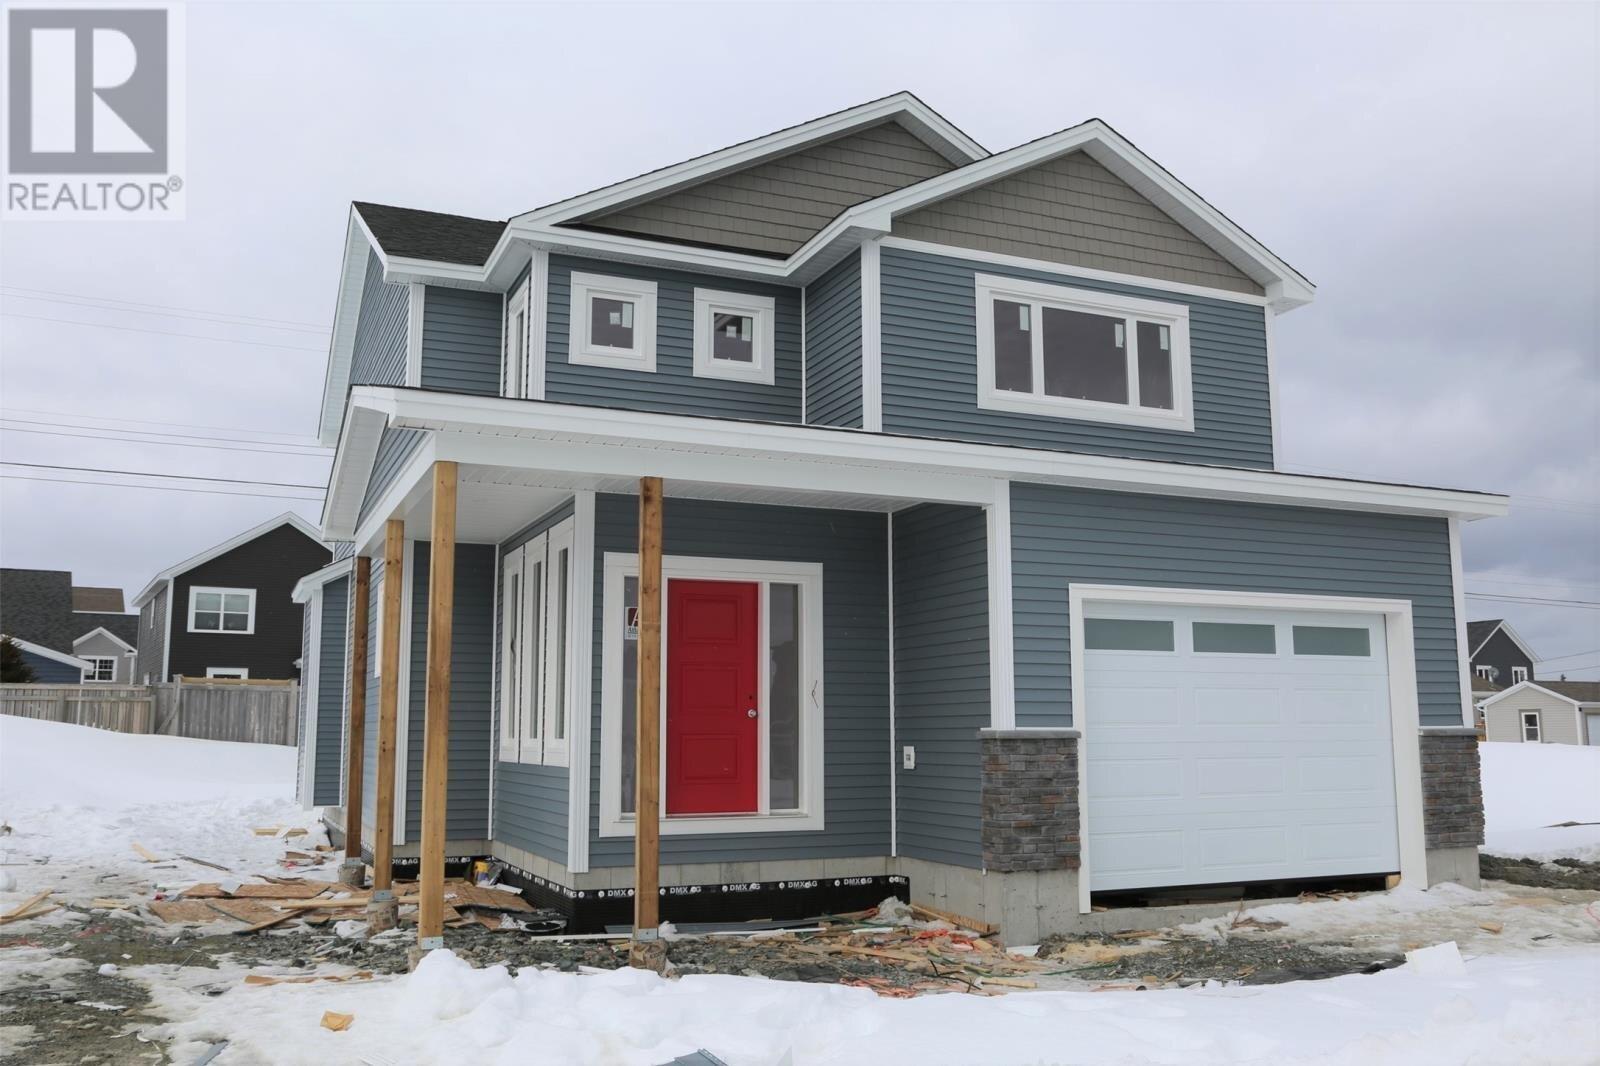 House for sale at 57 Frampton Ave St. John's Newfoundland - MLS: 1224701